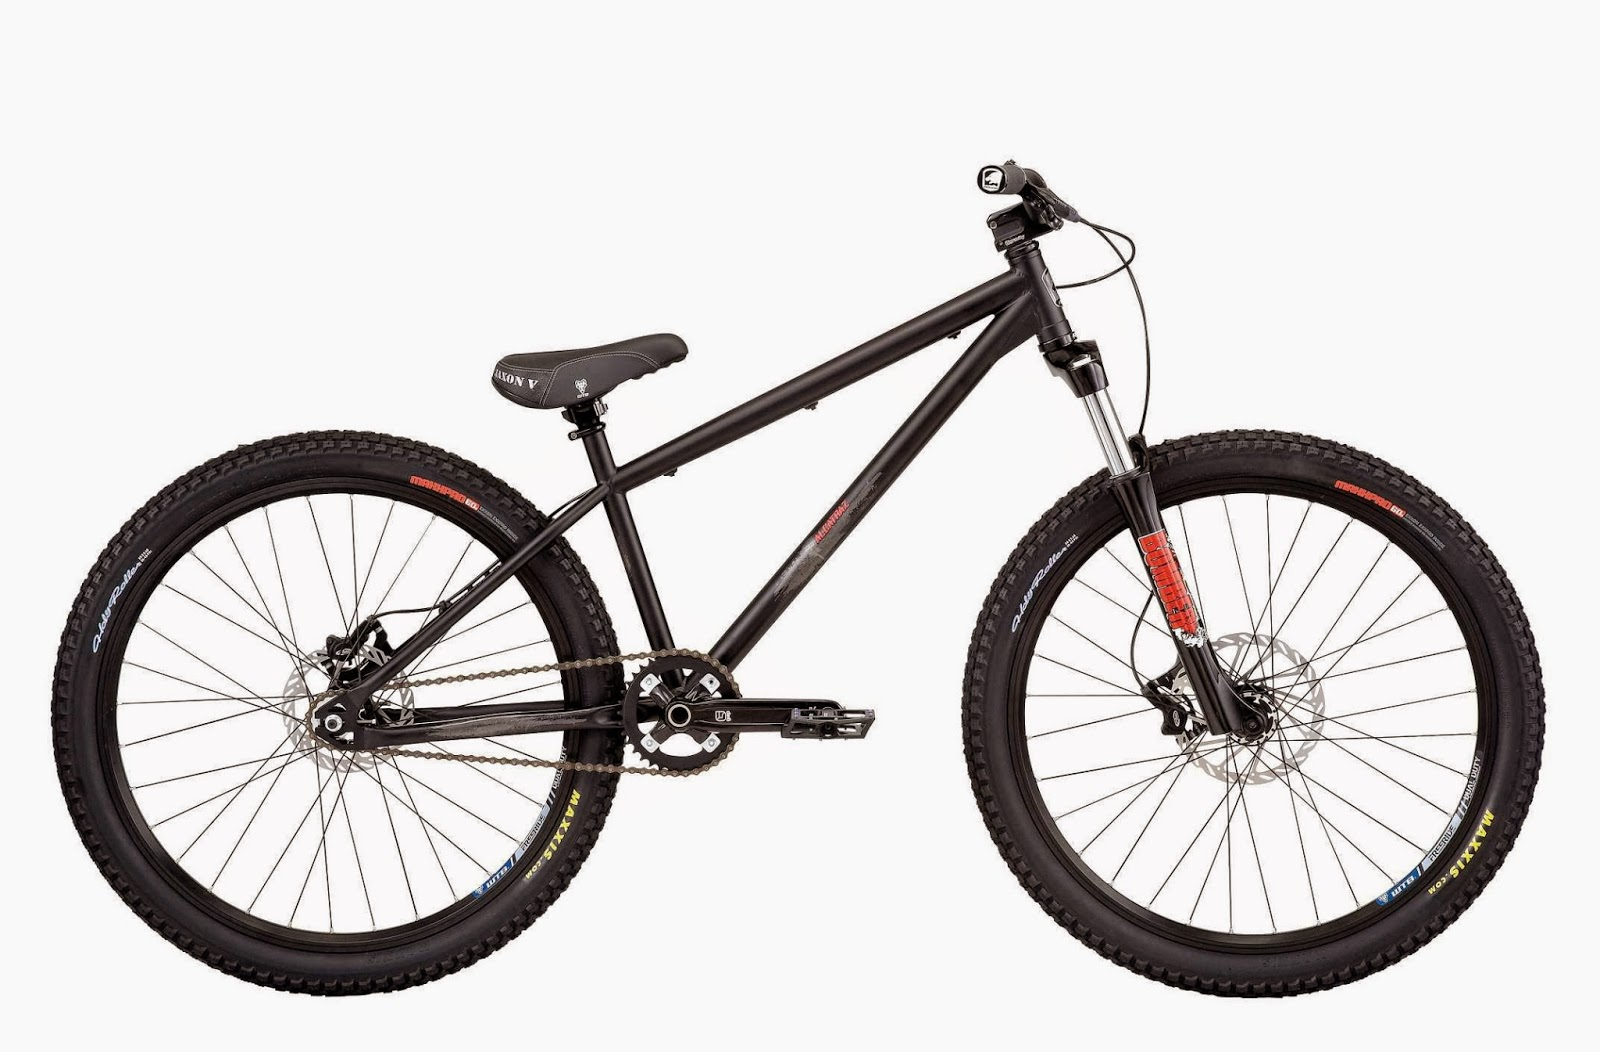 Jenis sepeda gunung MTB dirt jump